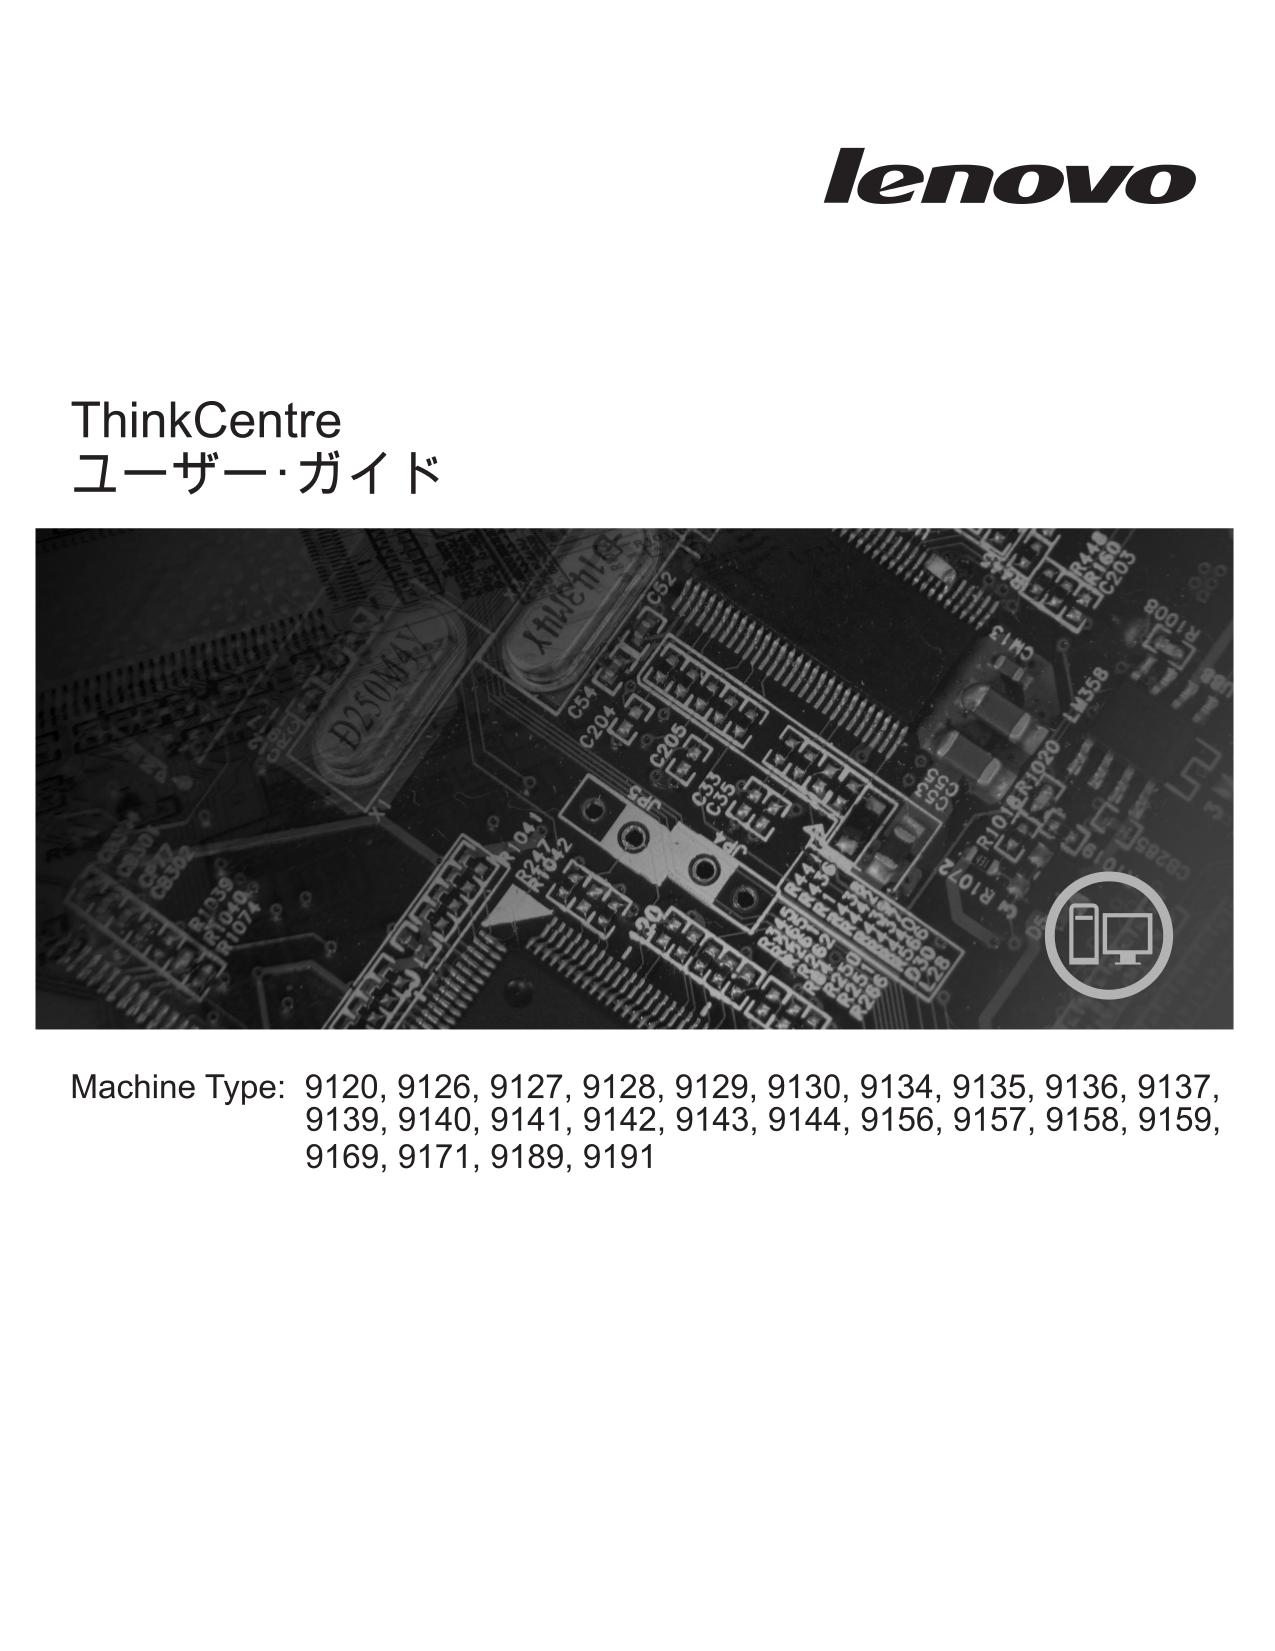 pdf for Lenovo Desktop ThinkCentre A61 9141 manual